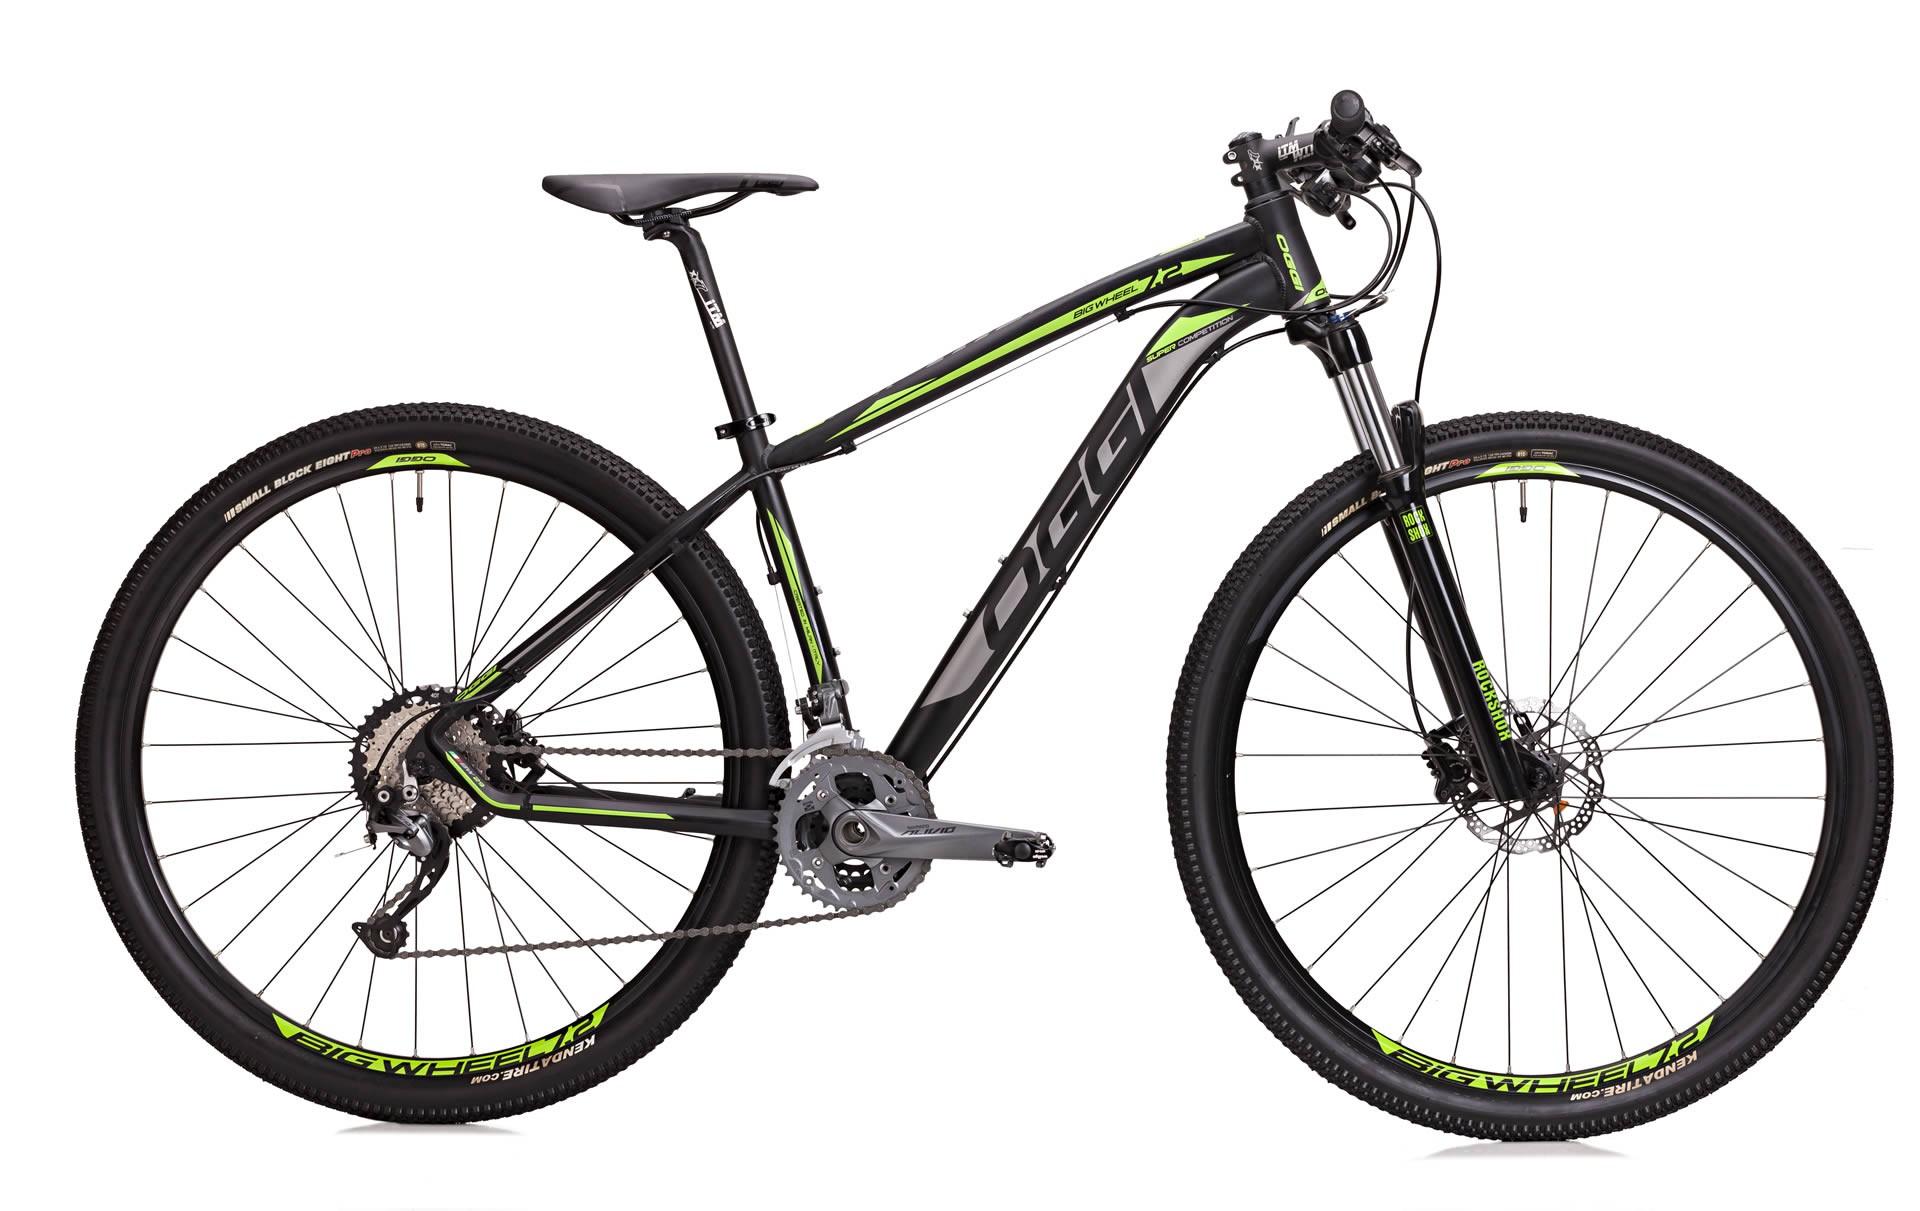 Bicicleta Oggi - Big Wheel 7.2 - 2018 - Preta / Verde / Cinza + Brinde